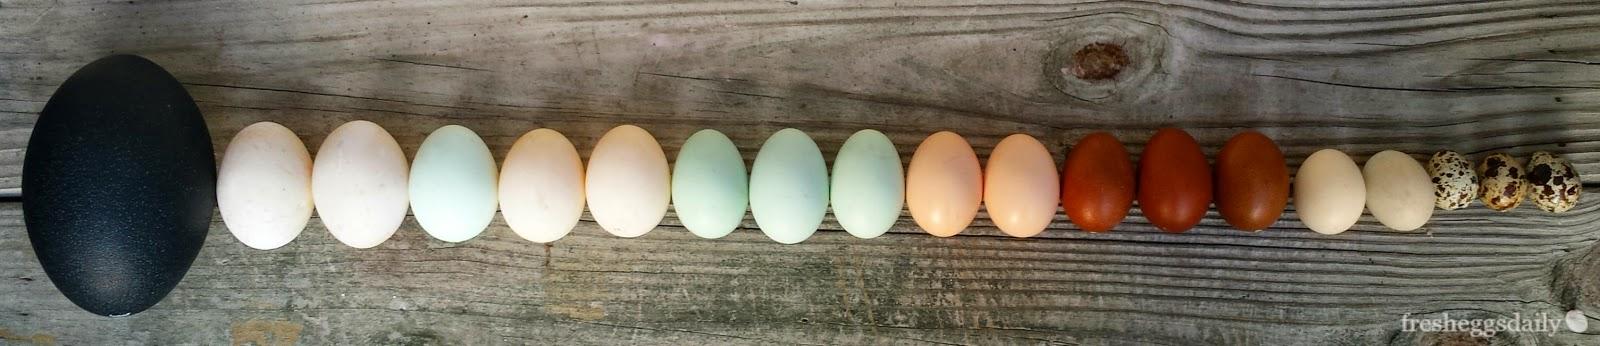 Egg as food  Wikipedia